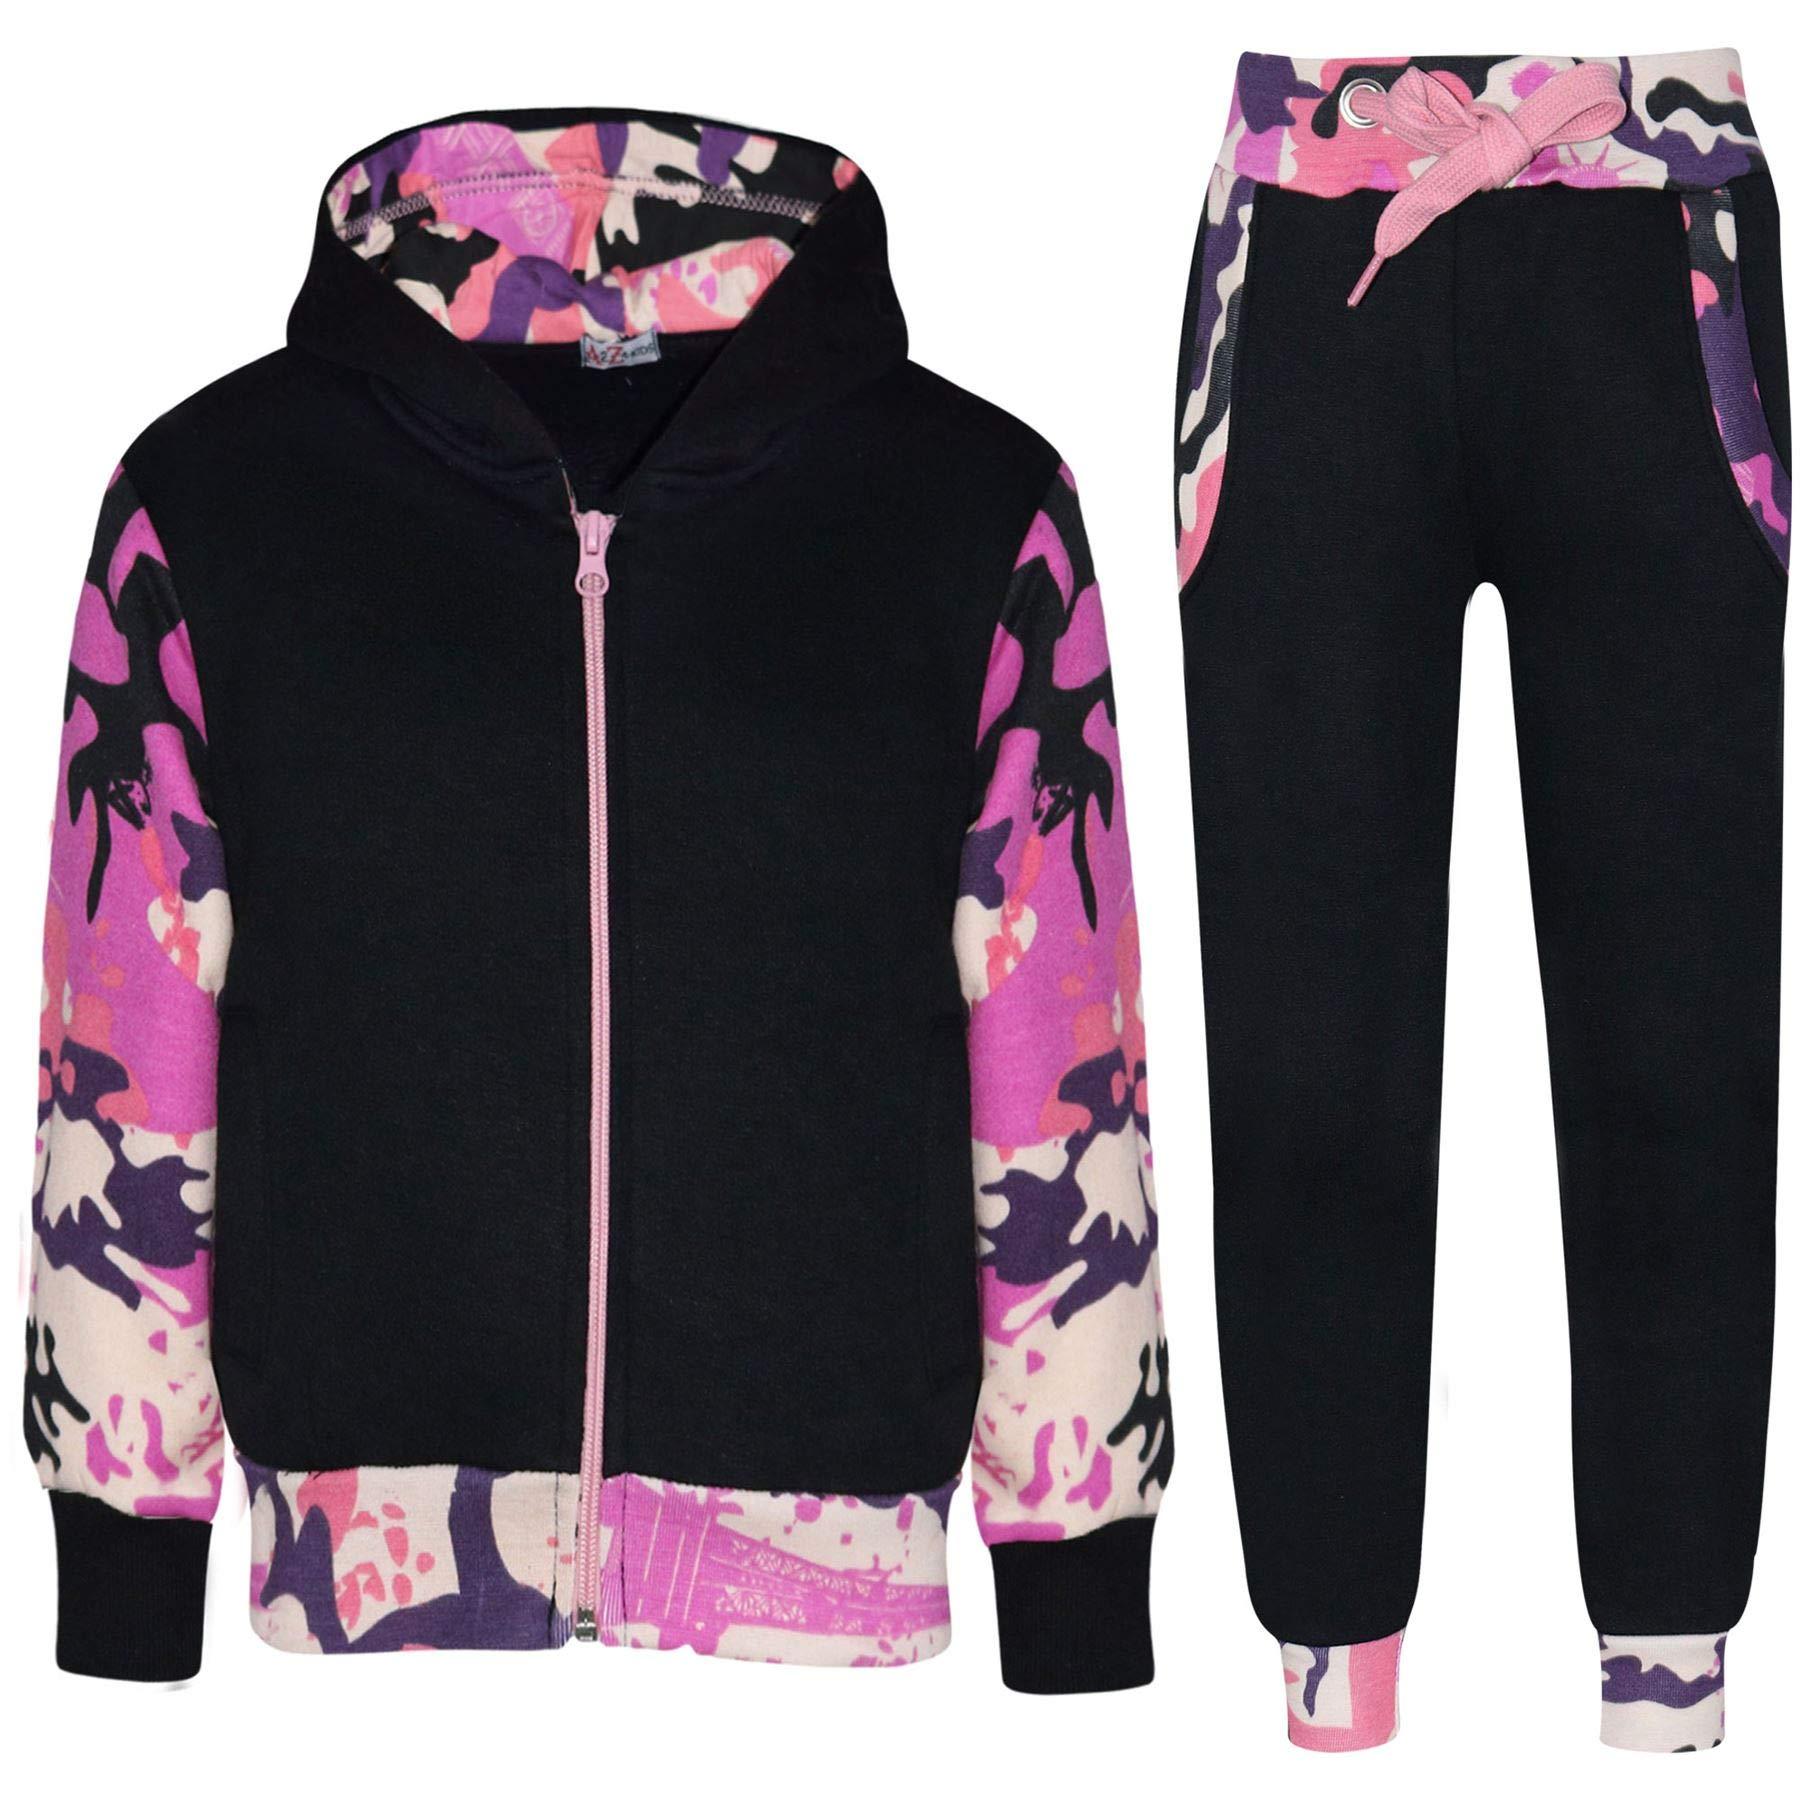 Kids Boys Girls Tracksuit Fleece Hooded Top - T.S Plain 101 Camo Baby Pink 13